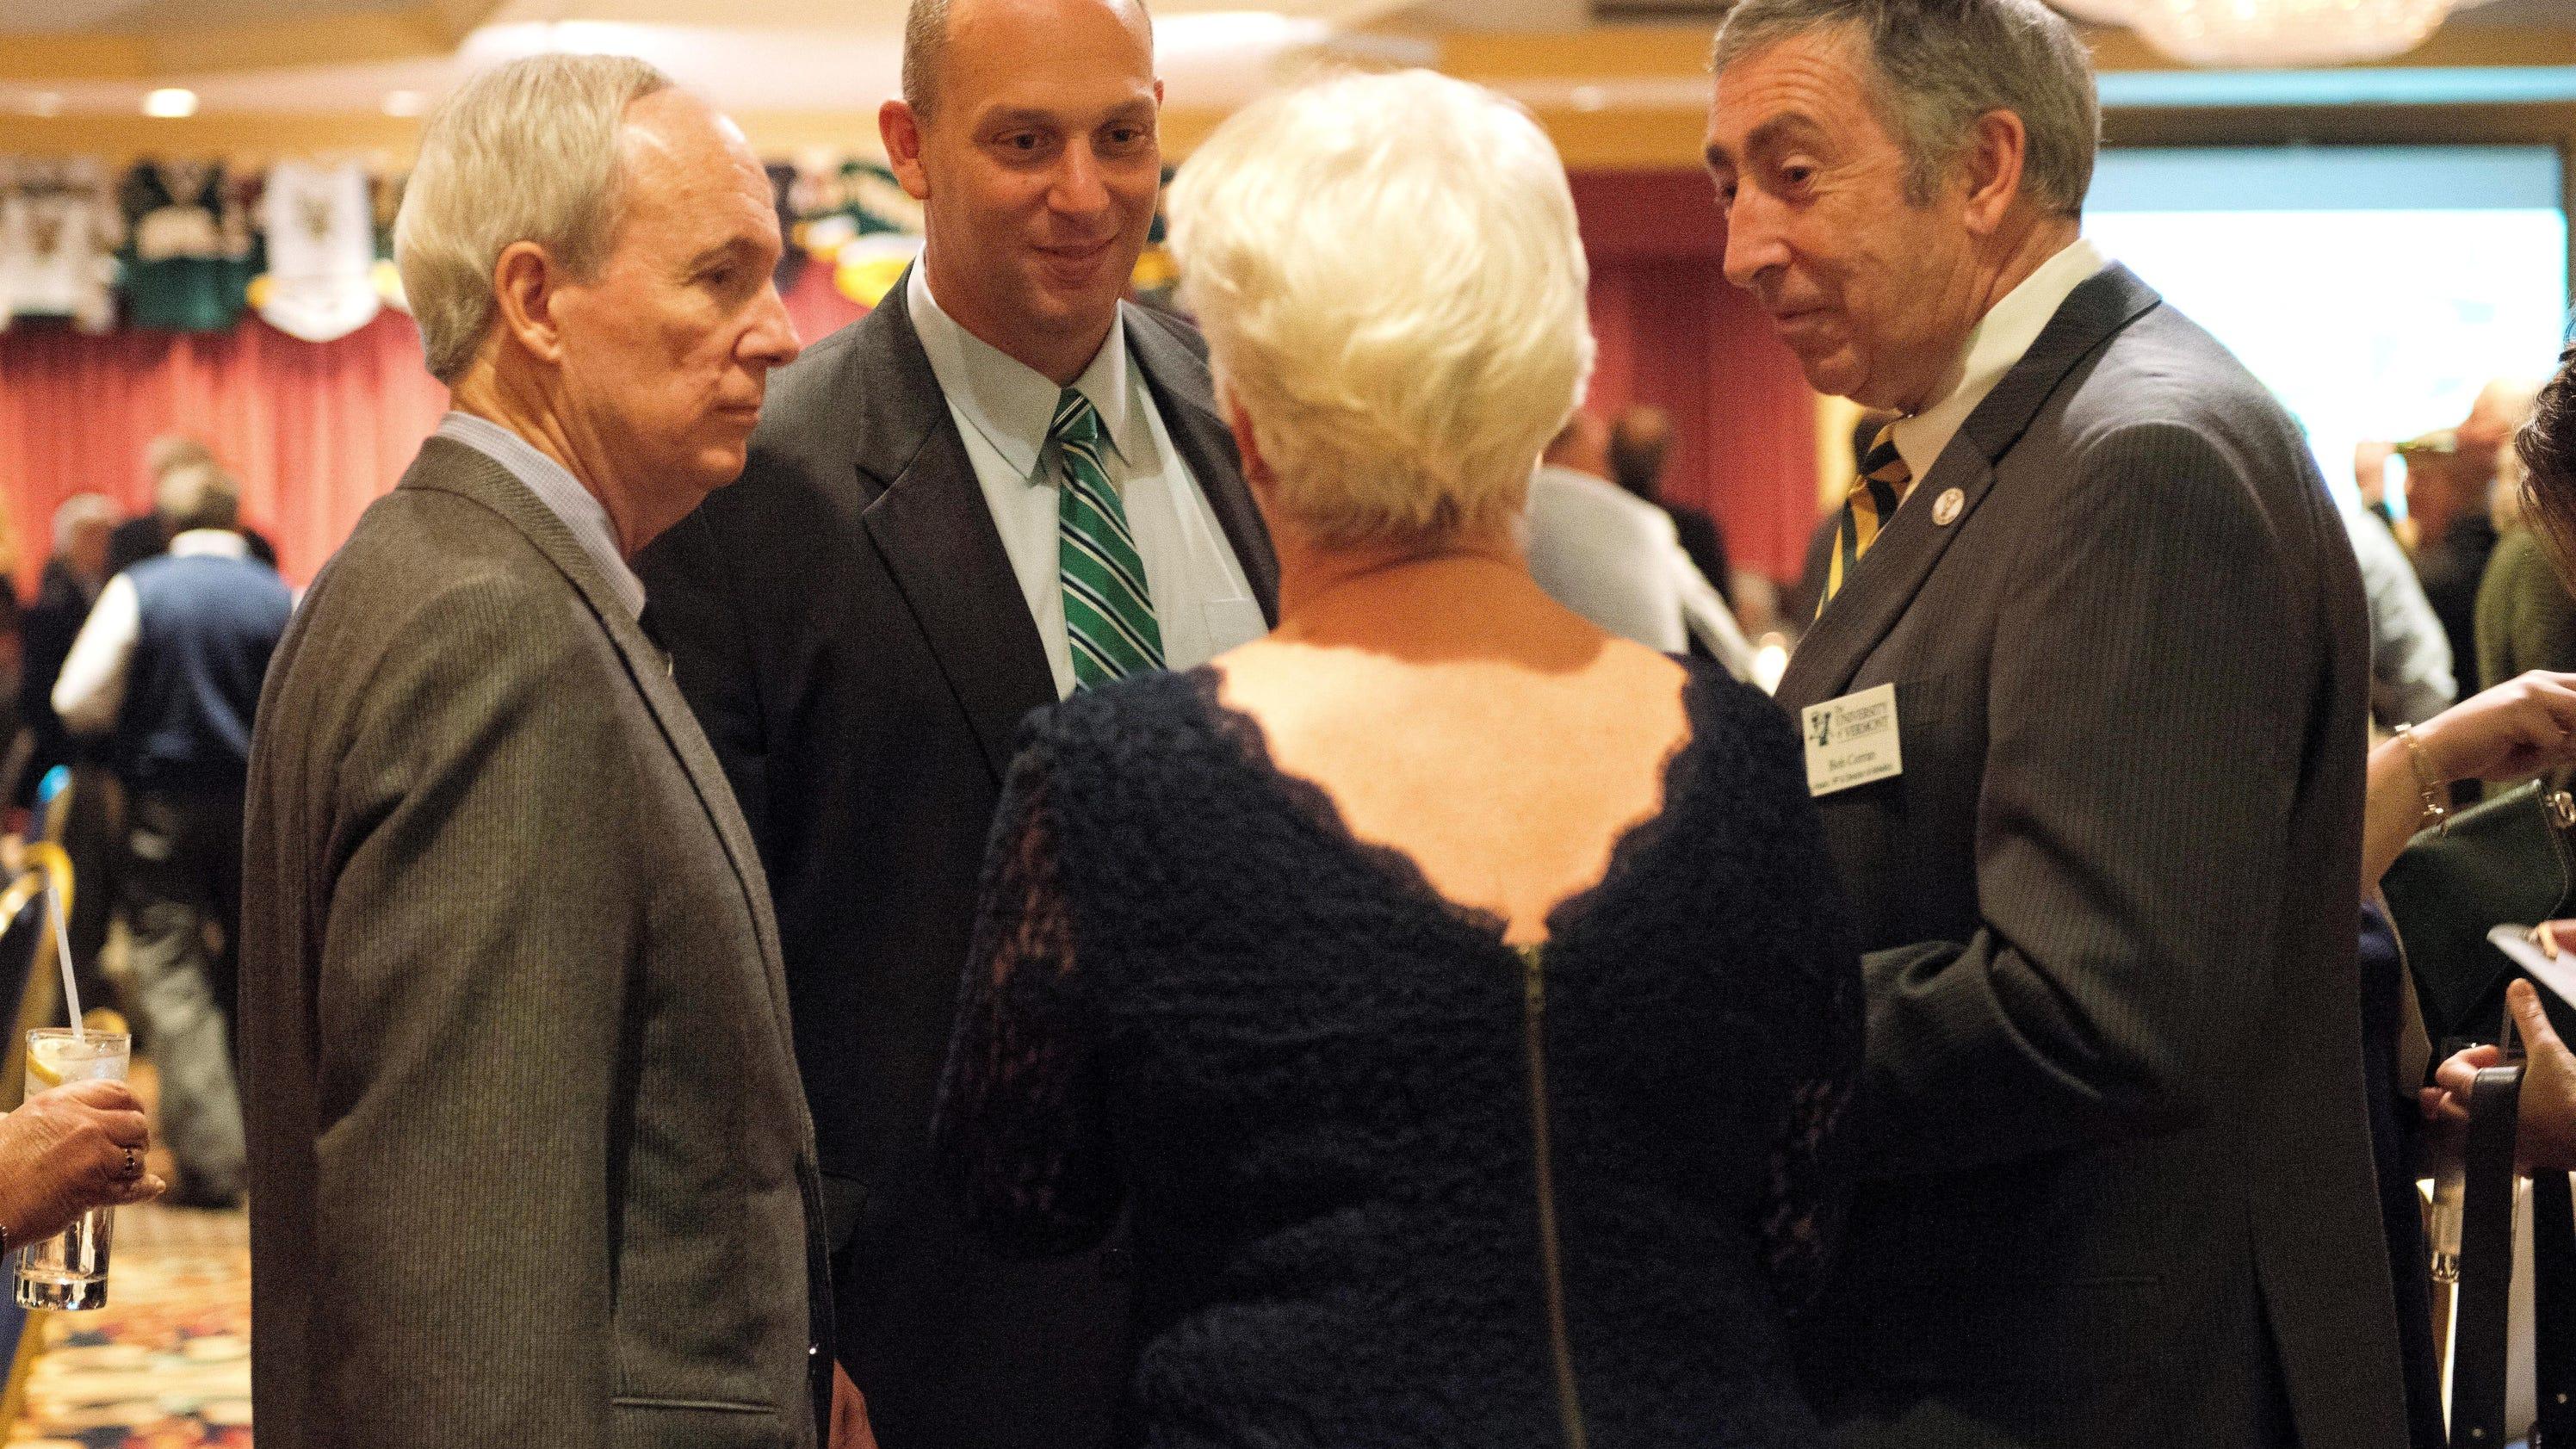 Schulman expresses vision for UVM's AD position - BurlingtonFreePress.com